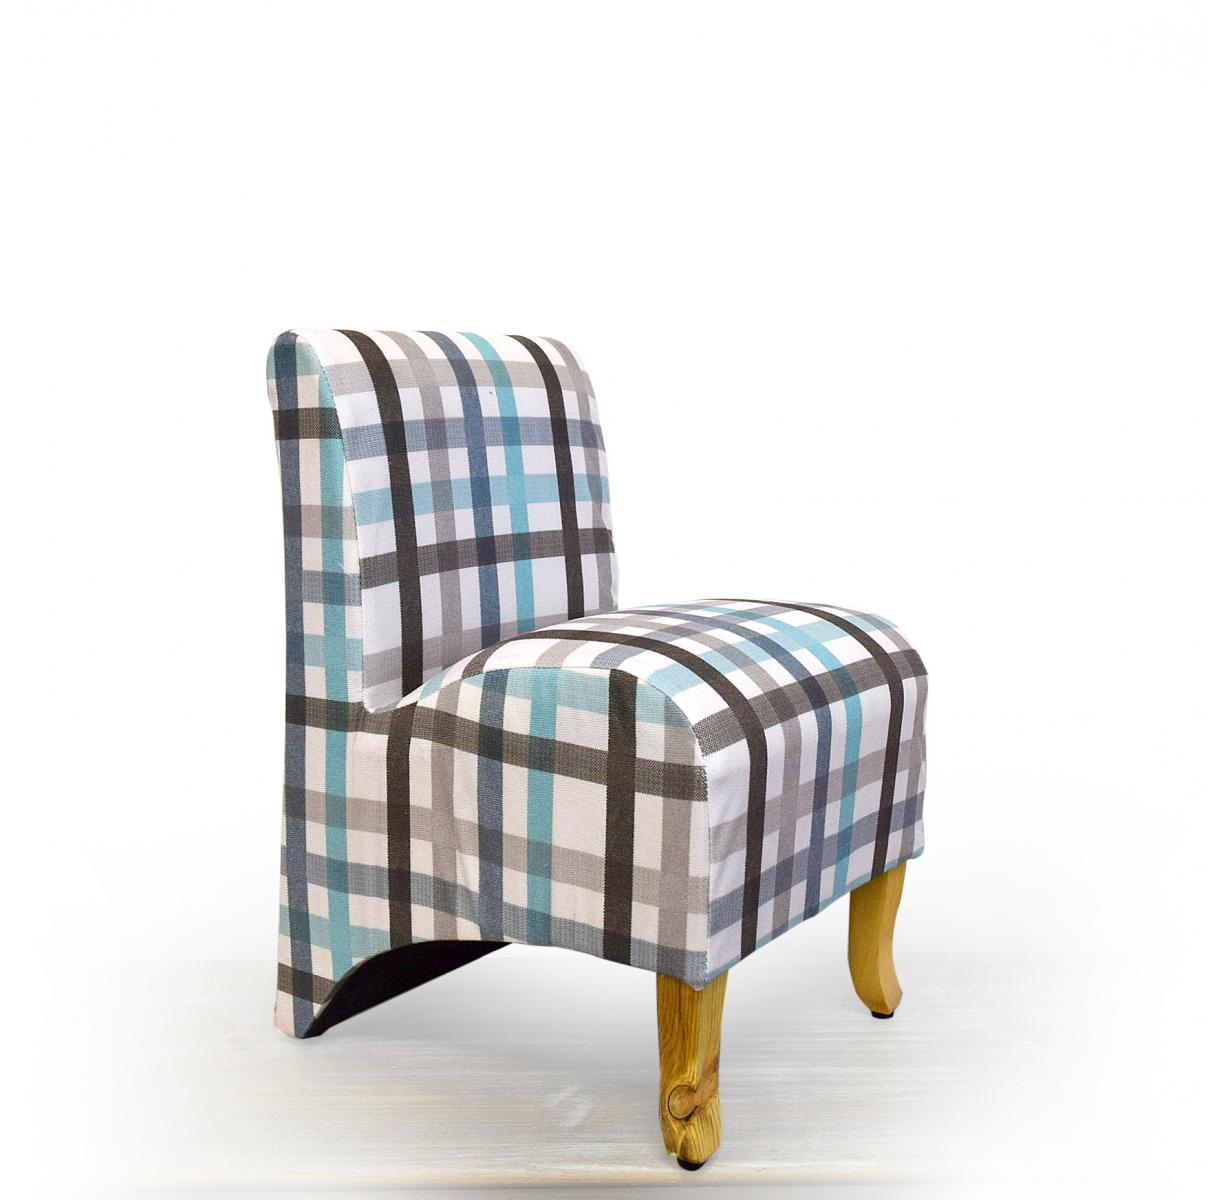 mini p small chair sofa stool cushions 17 colours hallway be